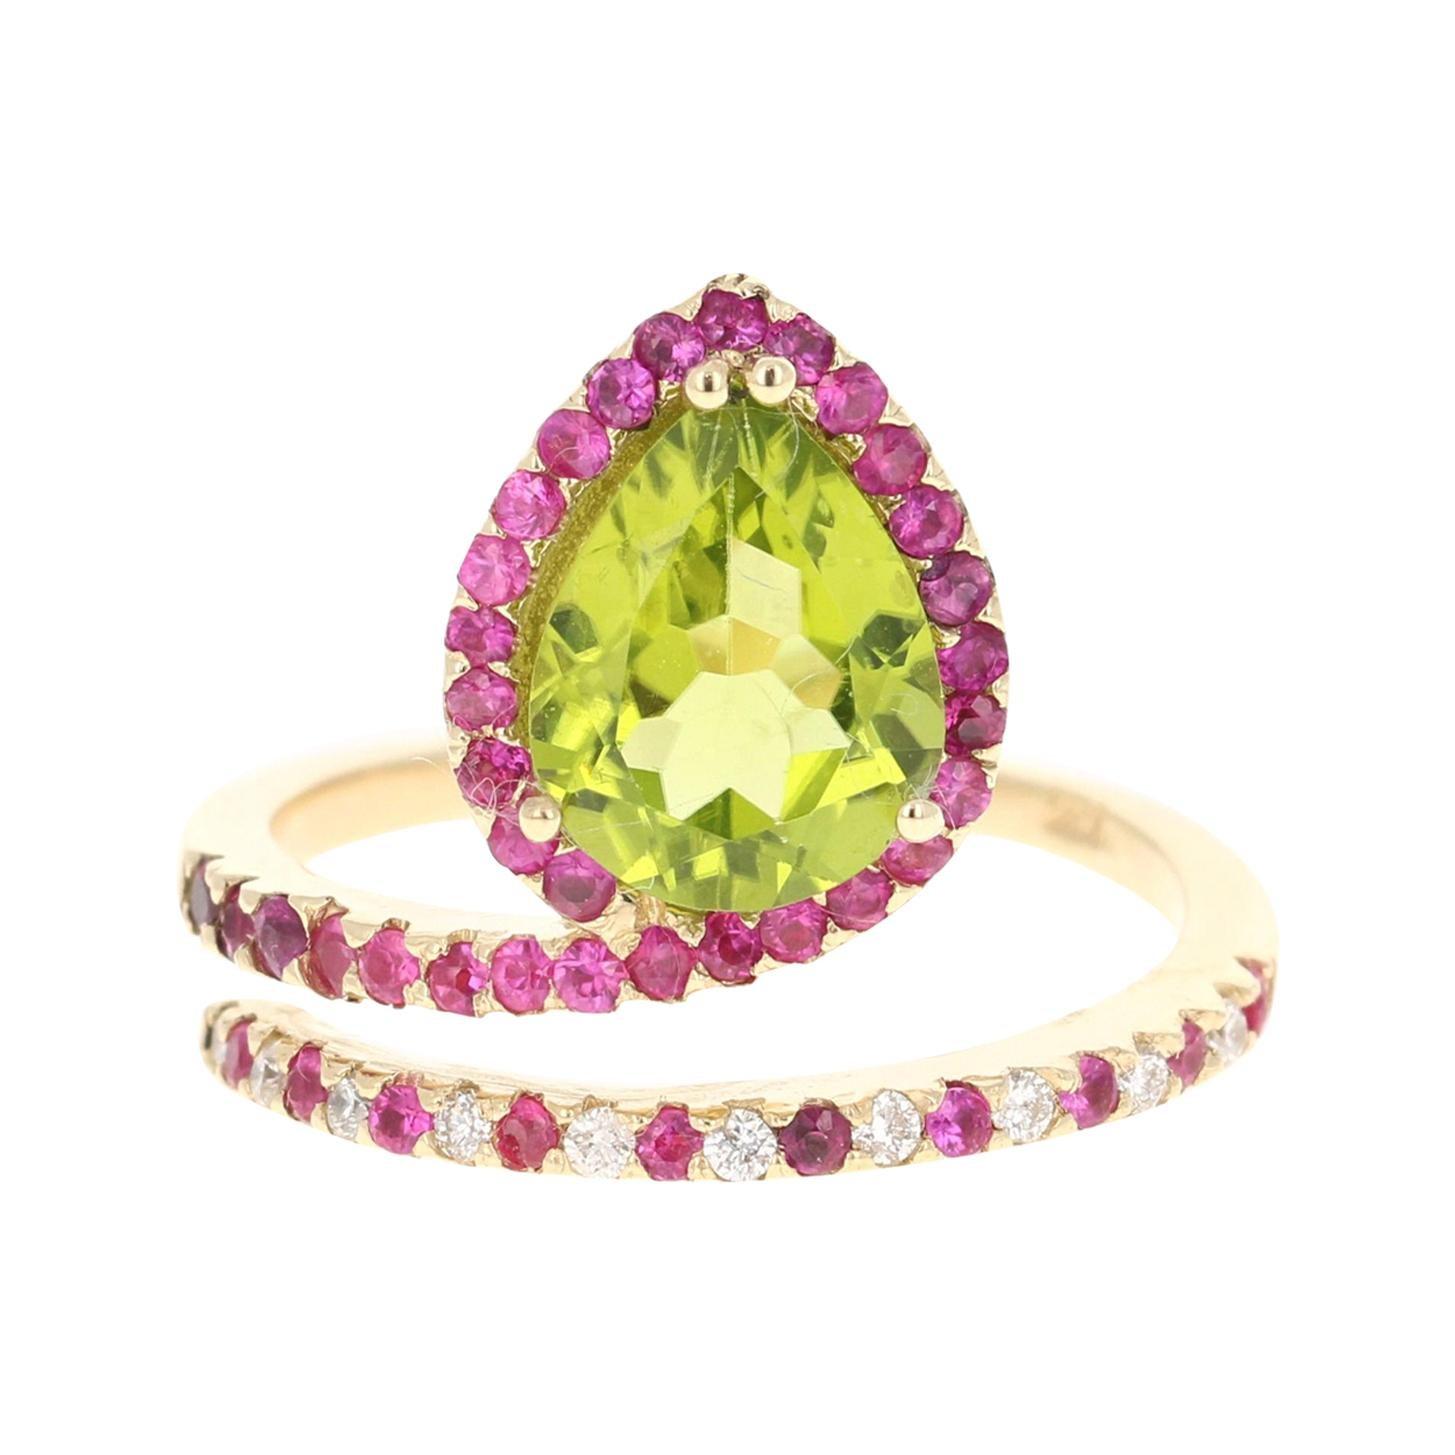 2.94 Carat Peridot Sapphire Diamond 14 Karat Yellow Gold Engagement Ring